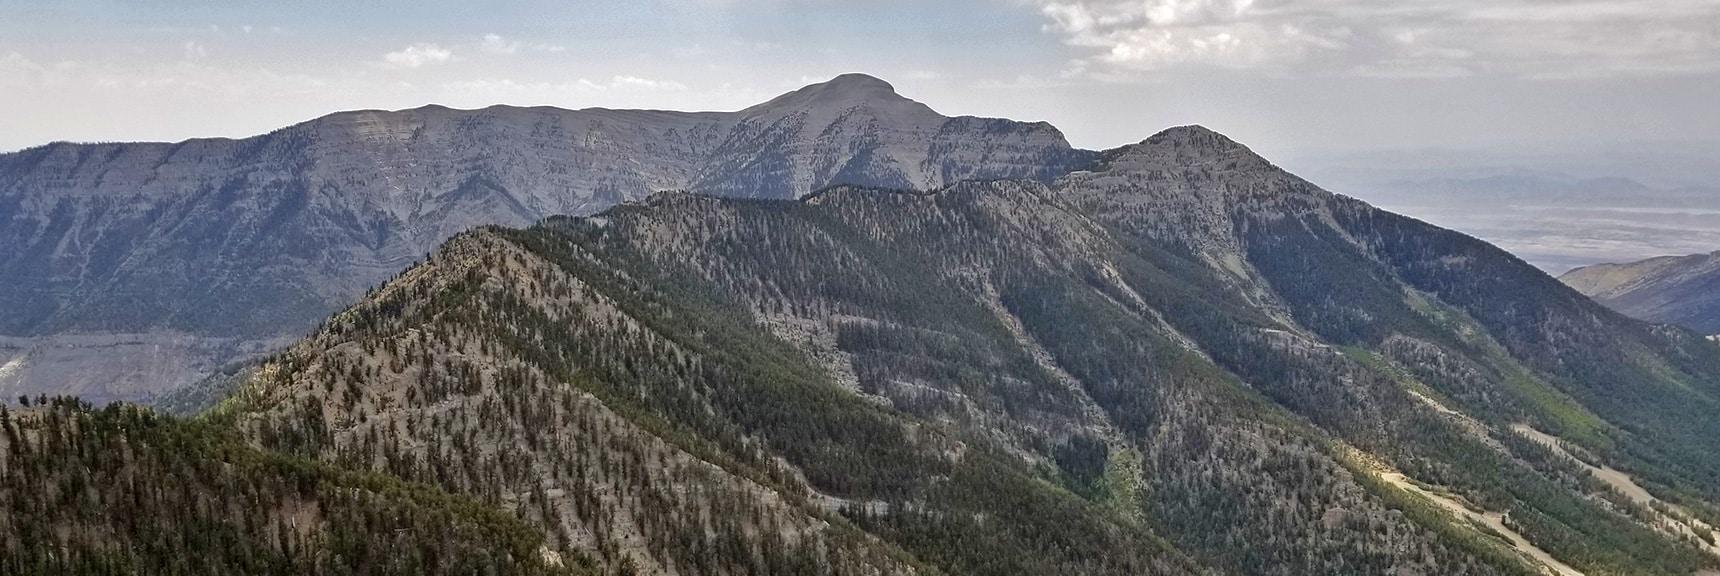 Ridge Passage from Lee Peak to Mummy Mt. with Charleston Peak in Background   Mummy Mountain Northern Rim Overlook, Spring Mountain Wilderness, Nevada